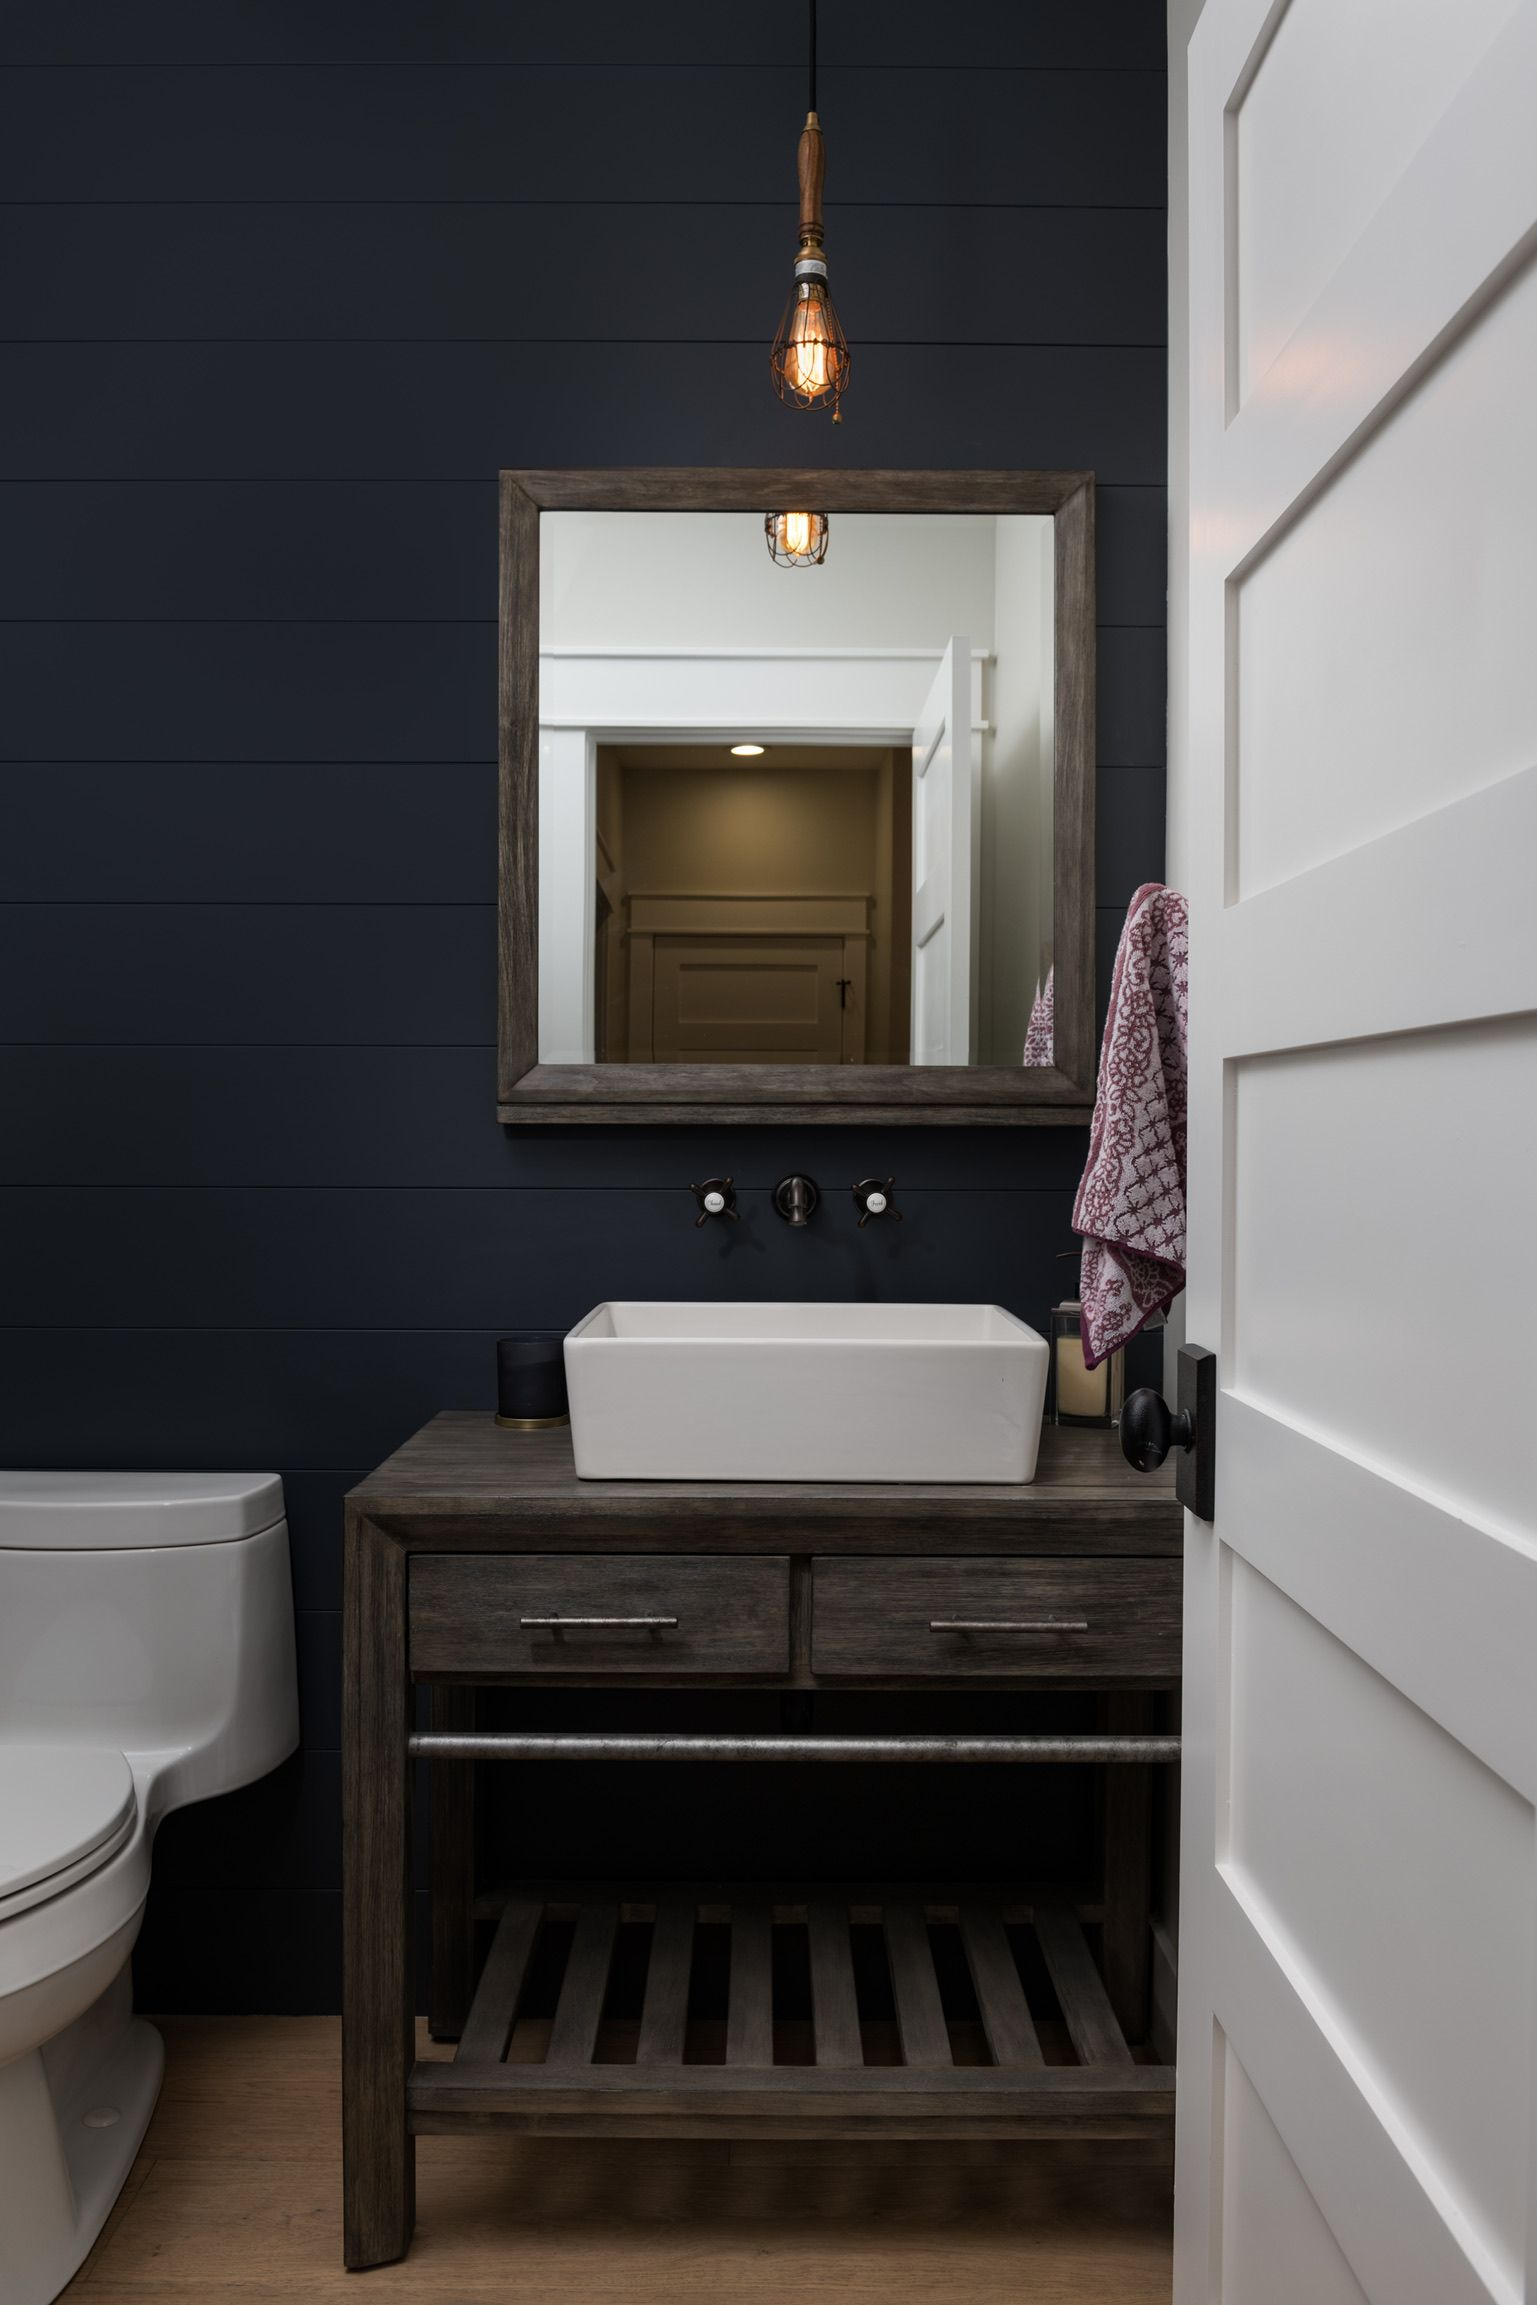 Dark Moody Bathroom Bathroom Inspiration Colors Bathroom Design Small Bathroom Design Luxury